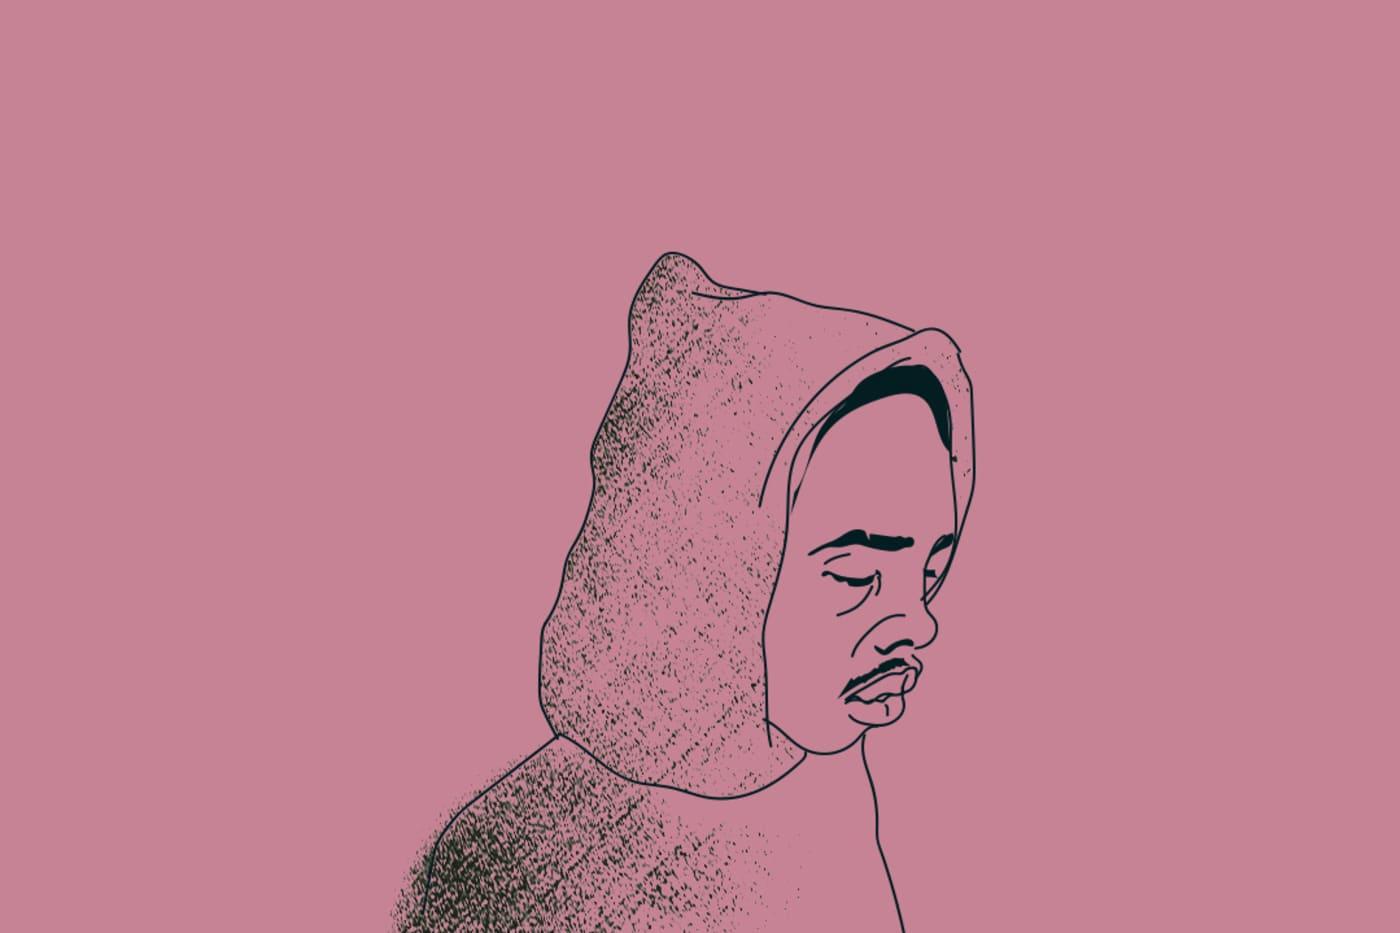 earl sweatshirt videos